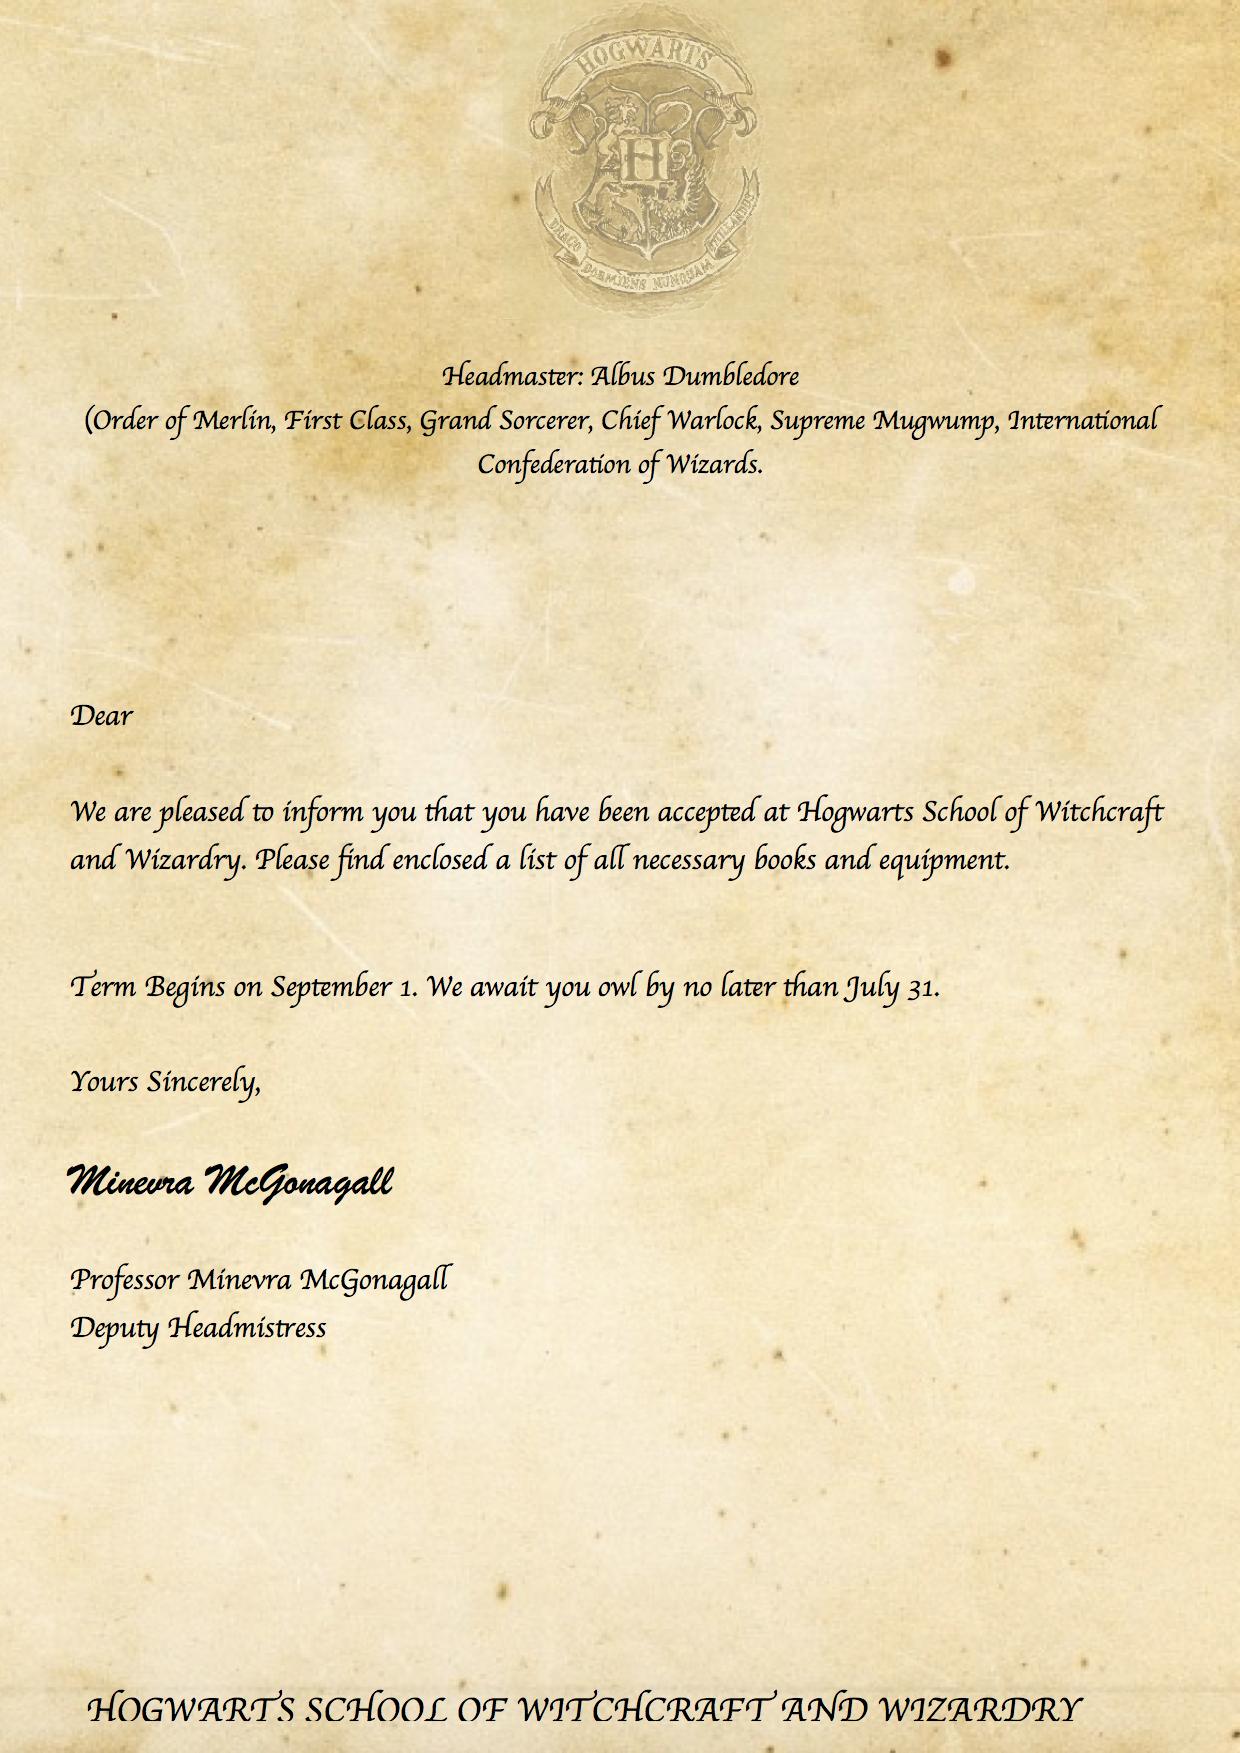 Pincaitlin Moore On Harry Potter ⚡ | Harry Potter Printables - Hogwarts Acceptance Letter Template Free Printable